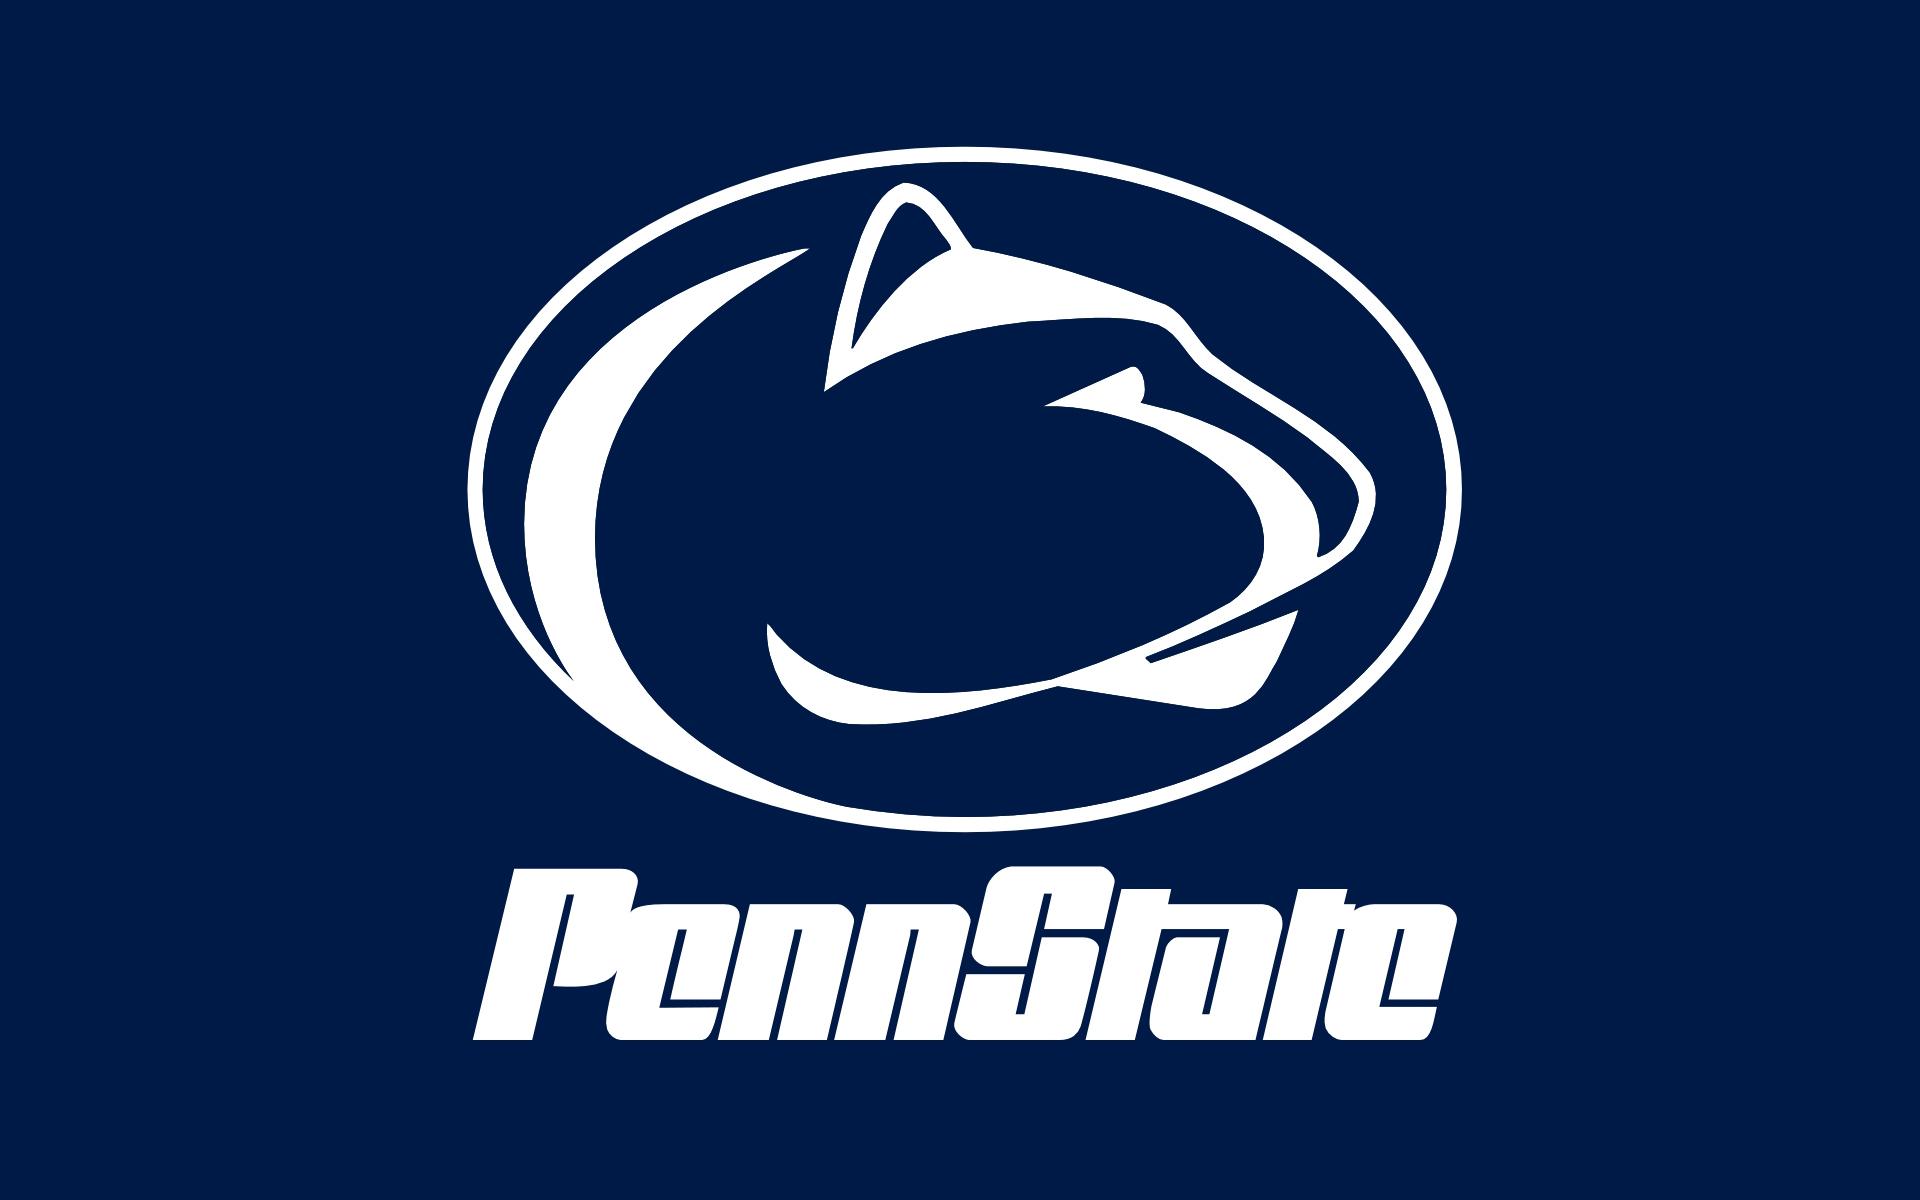 College Football Wallpapers Hd Penn State Football Logo Wallpaper 44453 1920x1200px